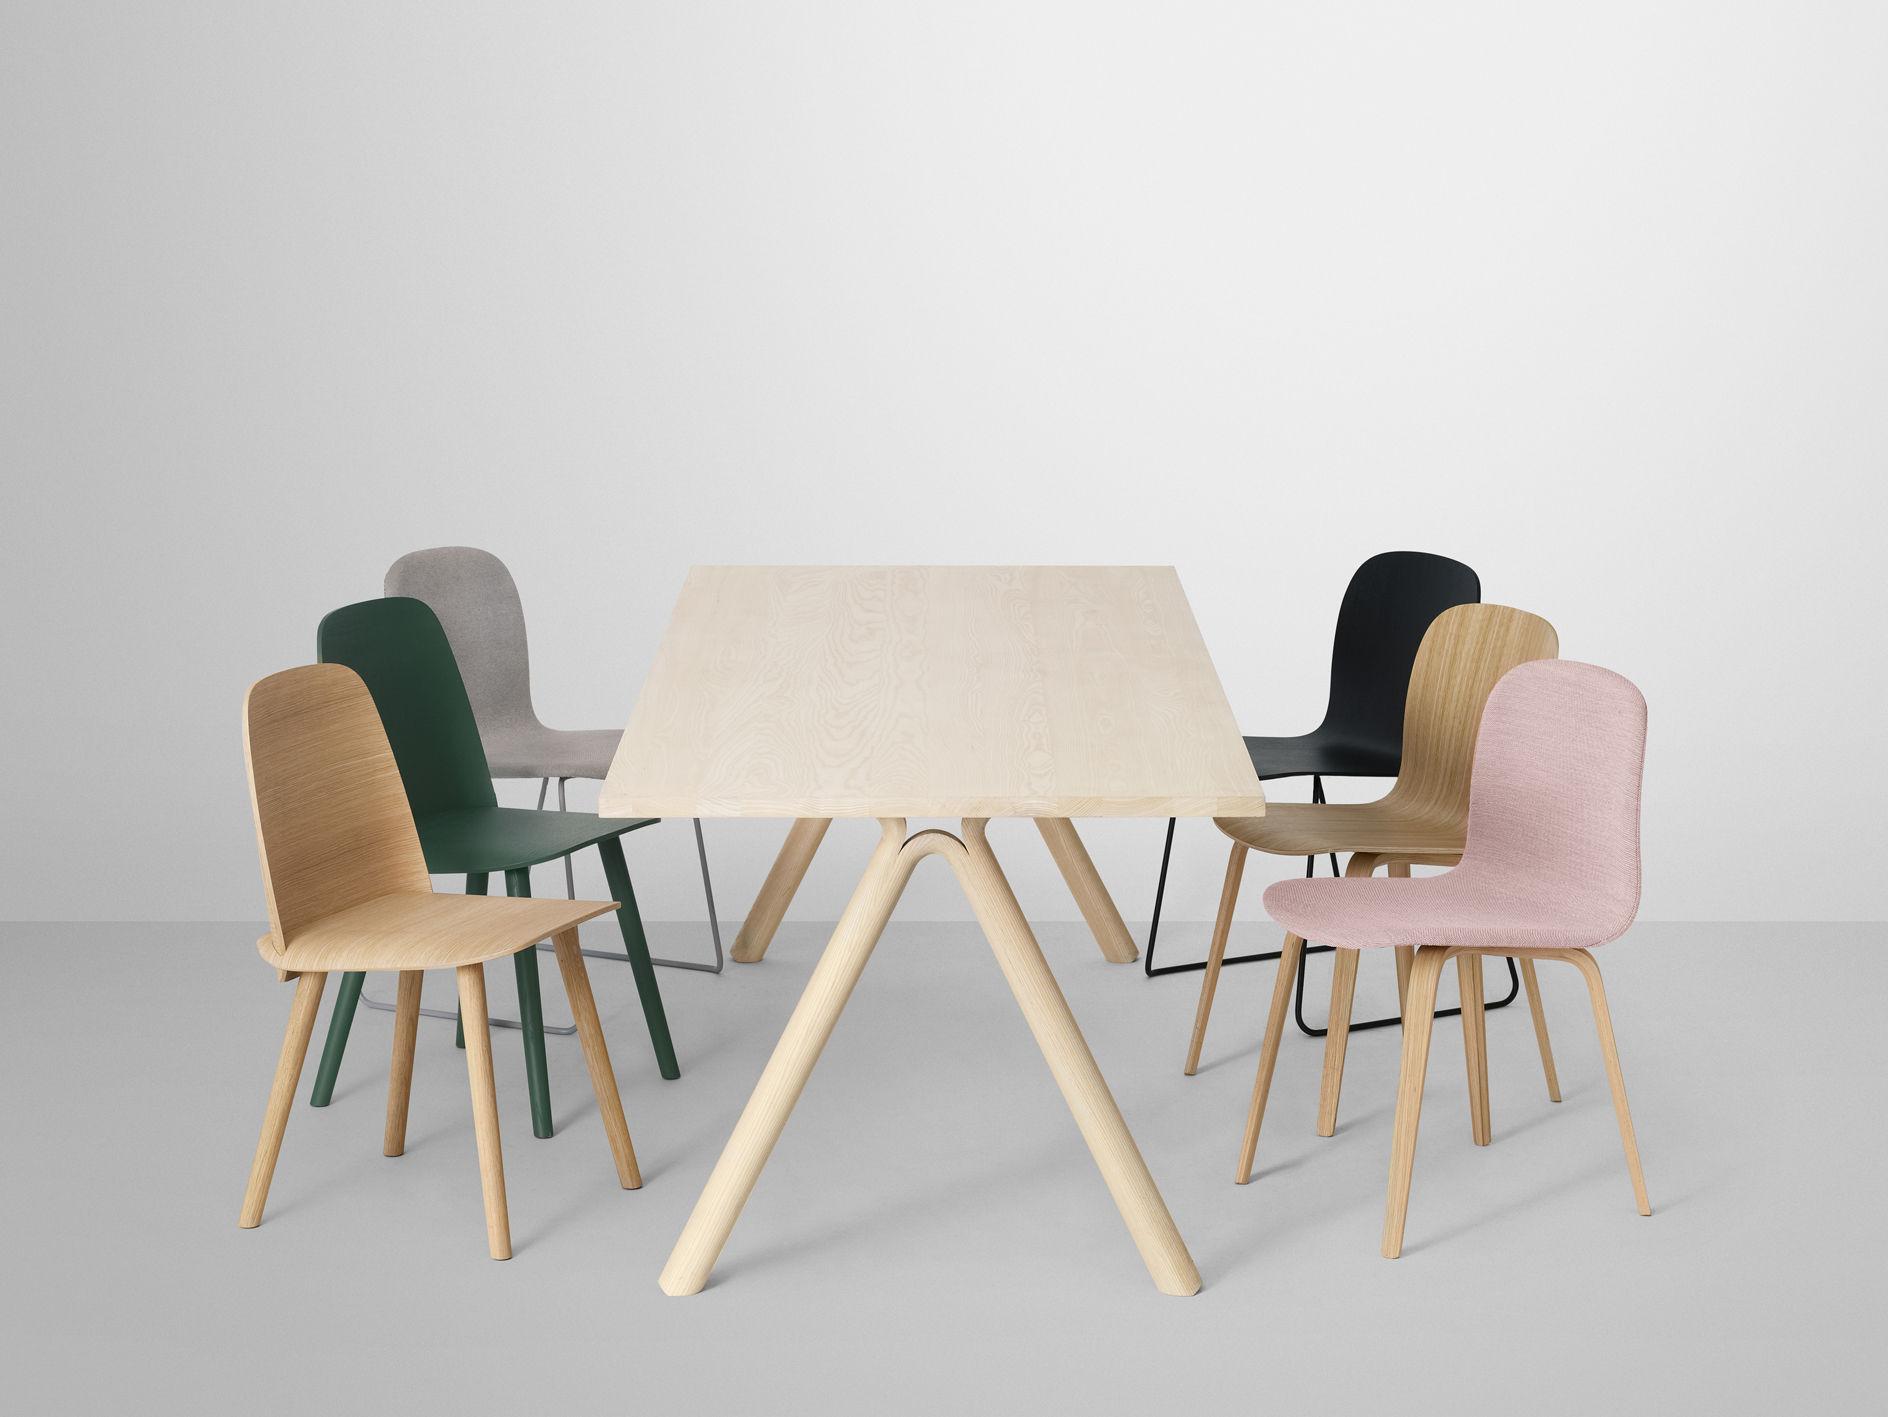 split l 220 cm muuto tisch. Black Bedroom Furniture Sets. Home Design Ideas